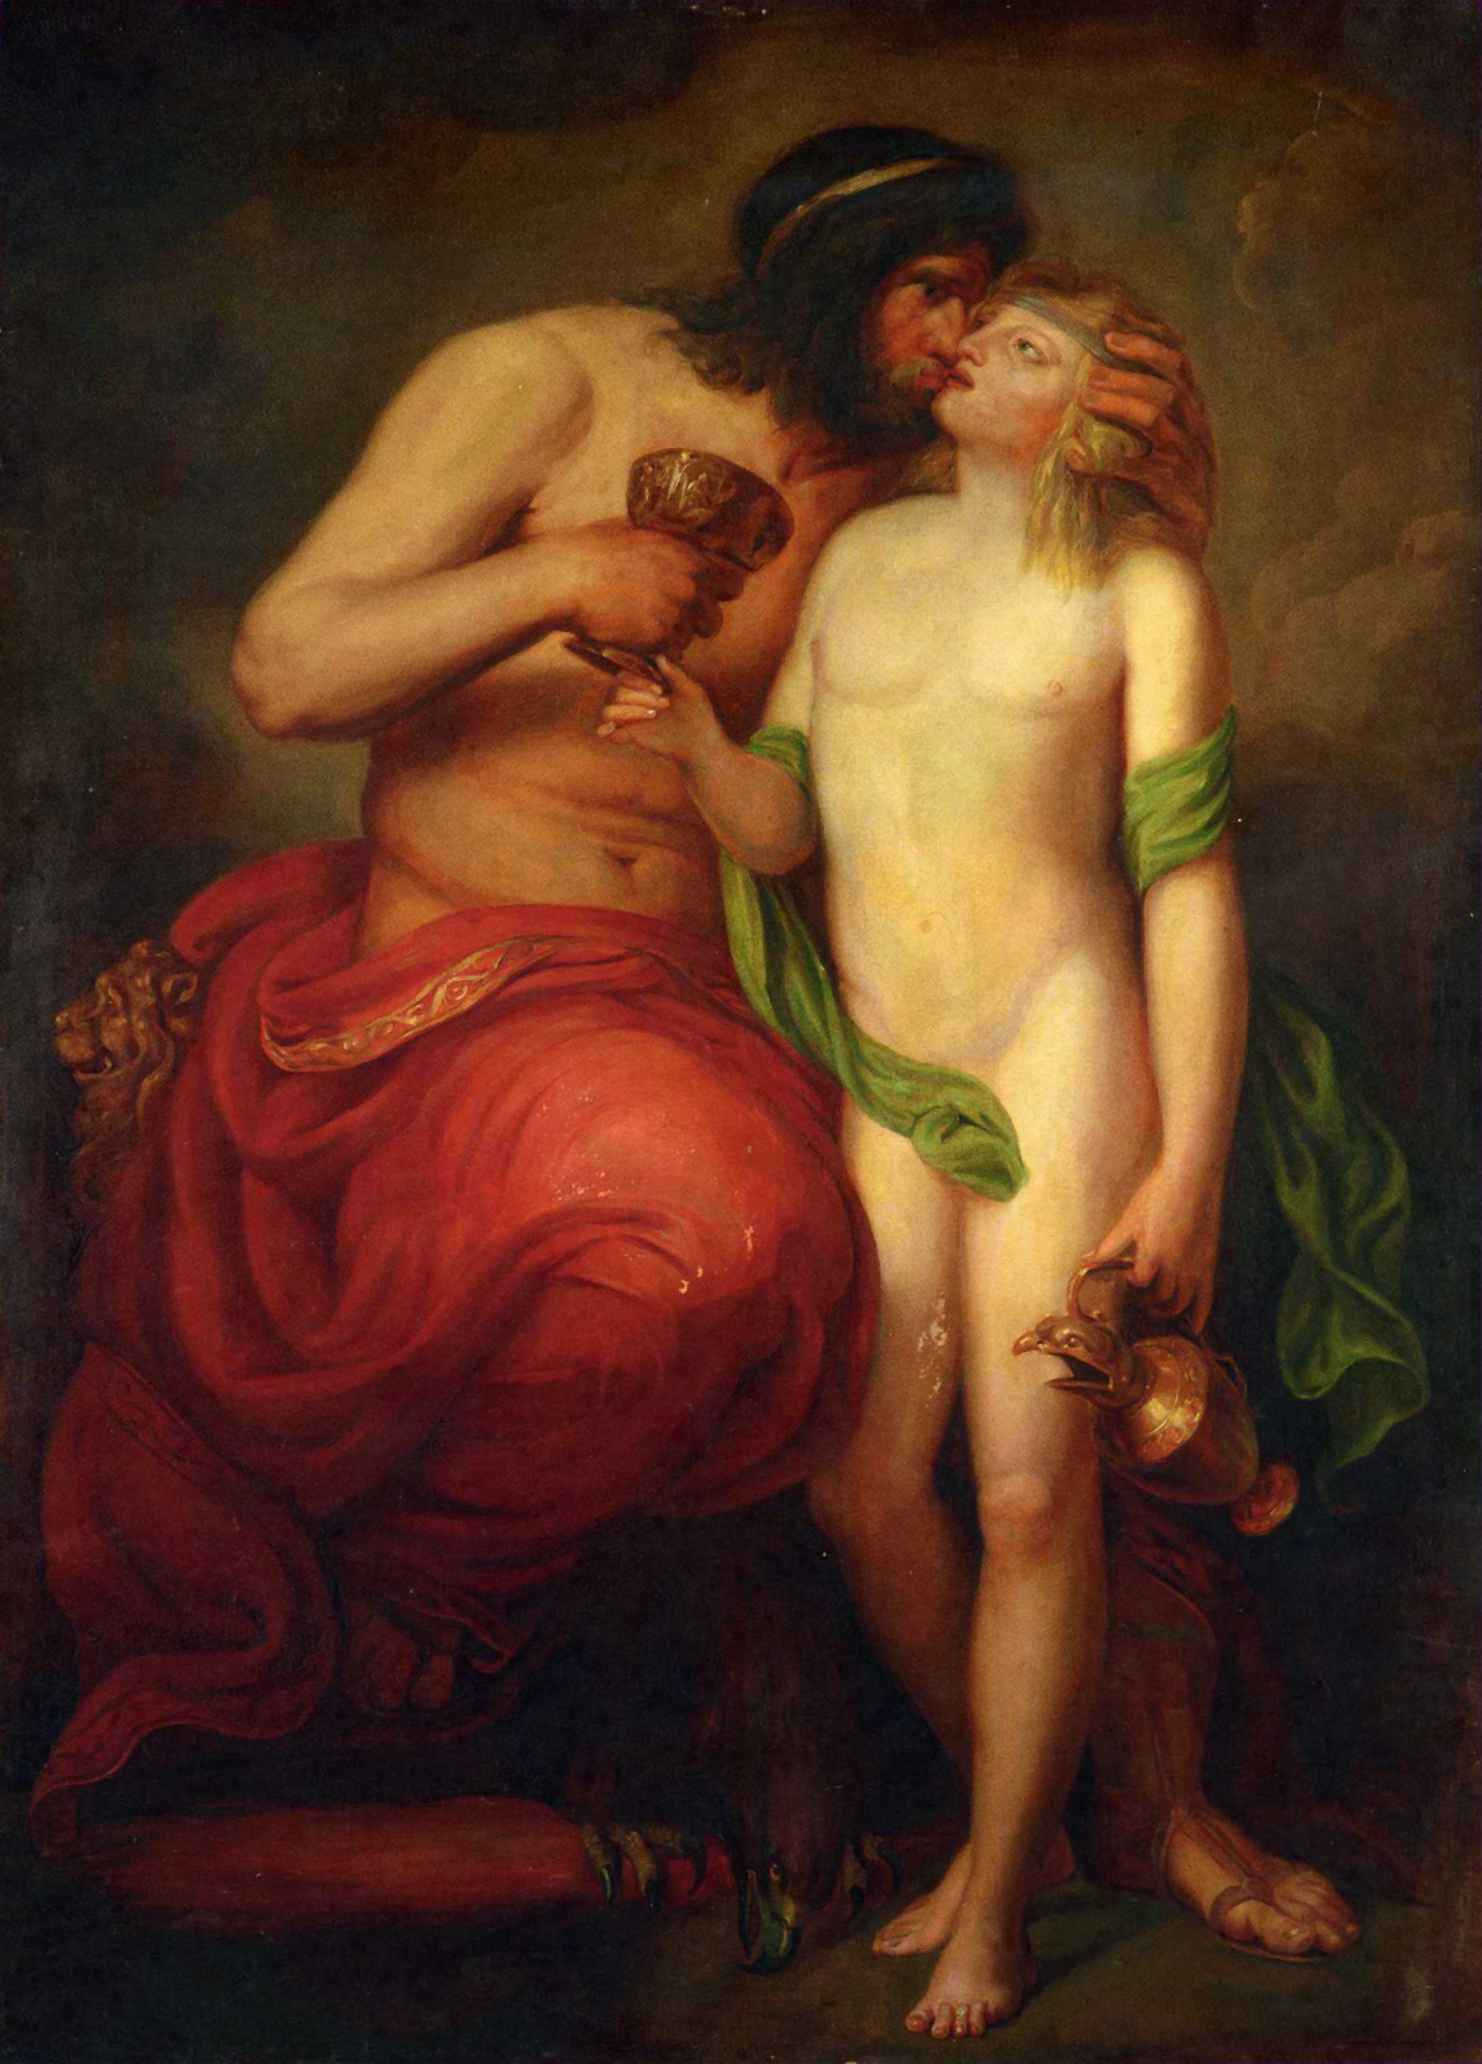 India erotic art gallery, sexy asian girl fucking